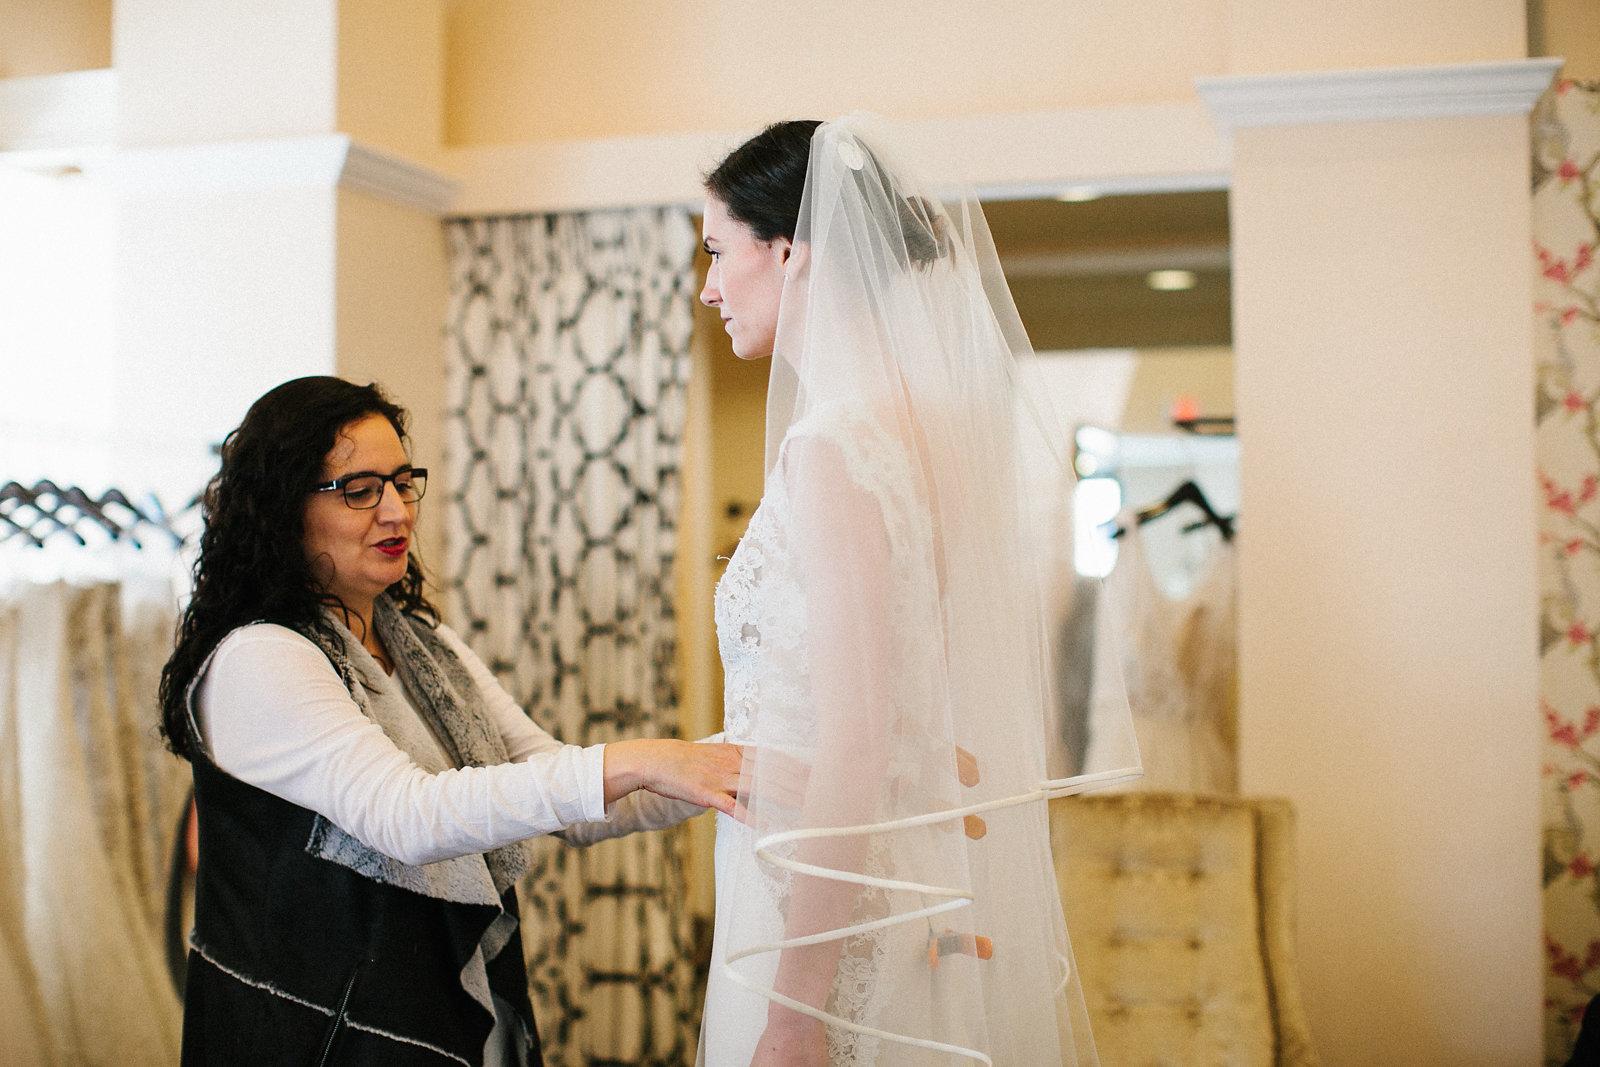 Wedding Wednesday: Trying On Wedding Dresses    Dallas, TX | BEING //  BRIDGET